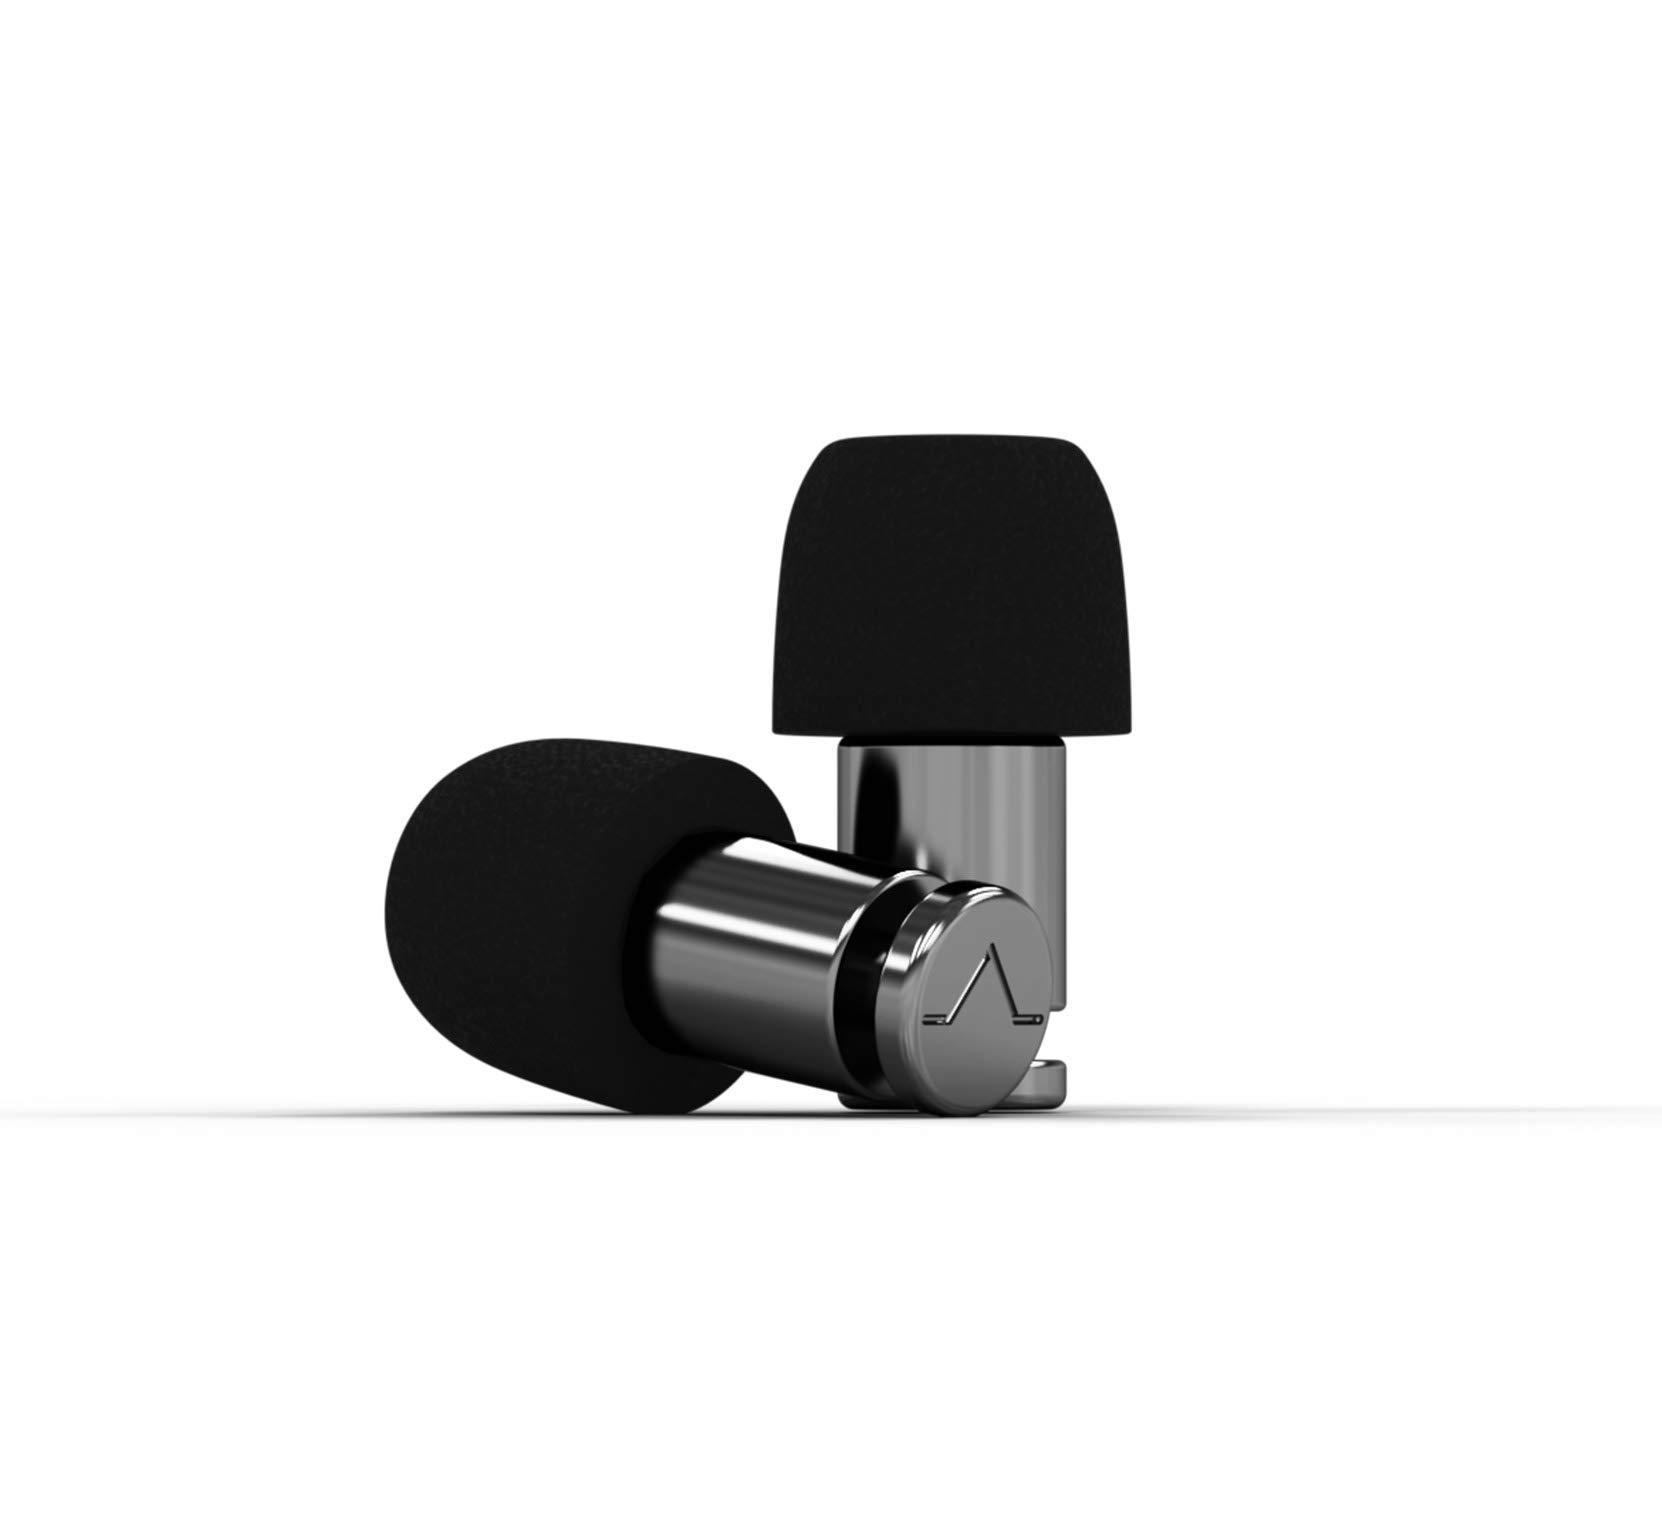 Flare Audio - Isolate MiNi Pro Polished Ear Protection Earplugs by FLARE AUDIO (Image #1)